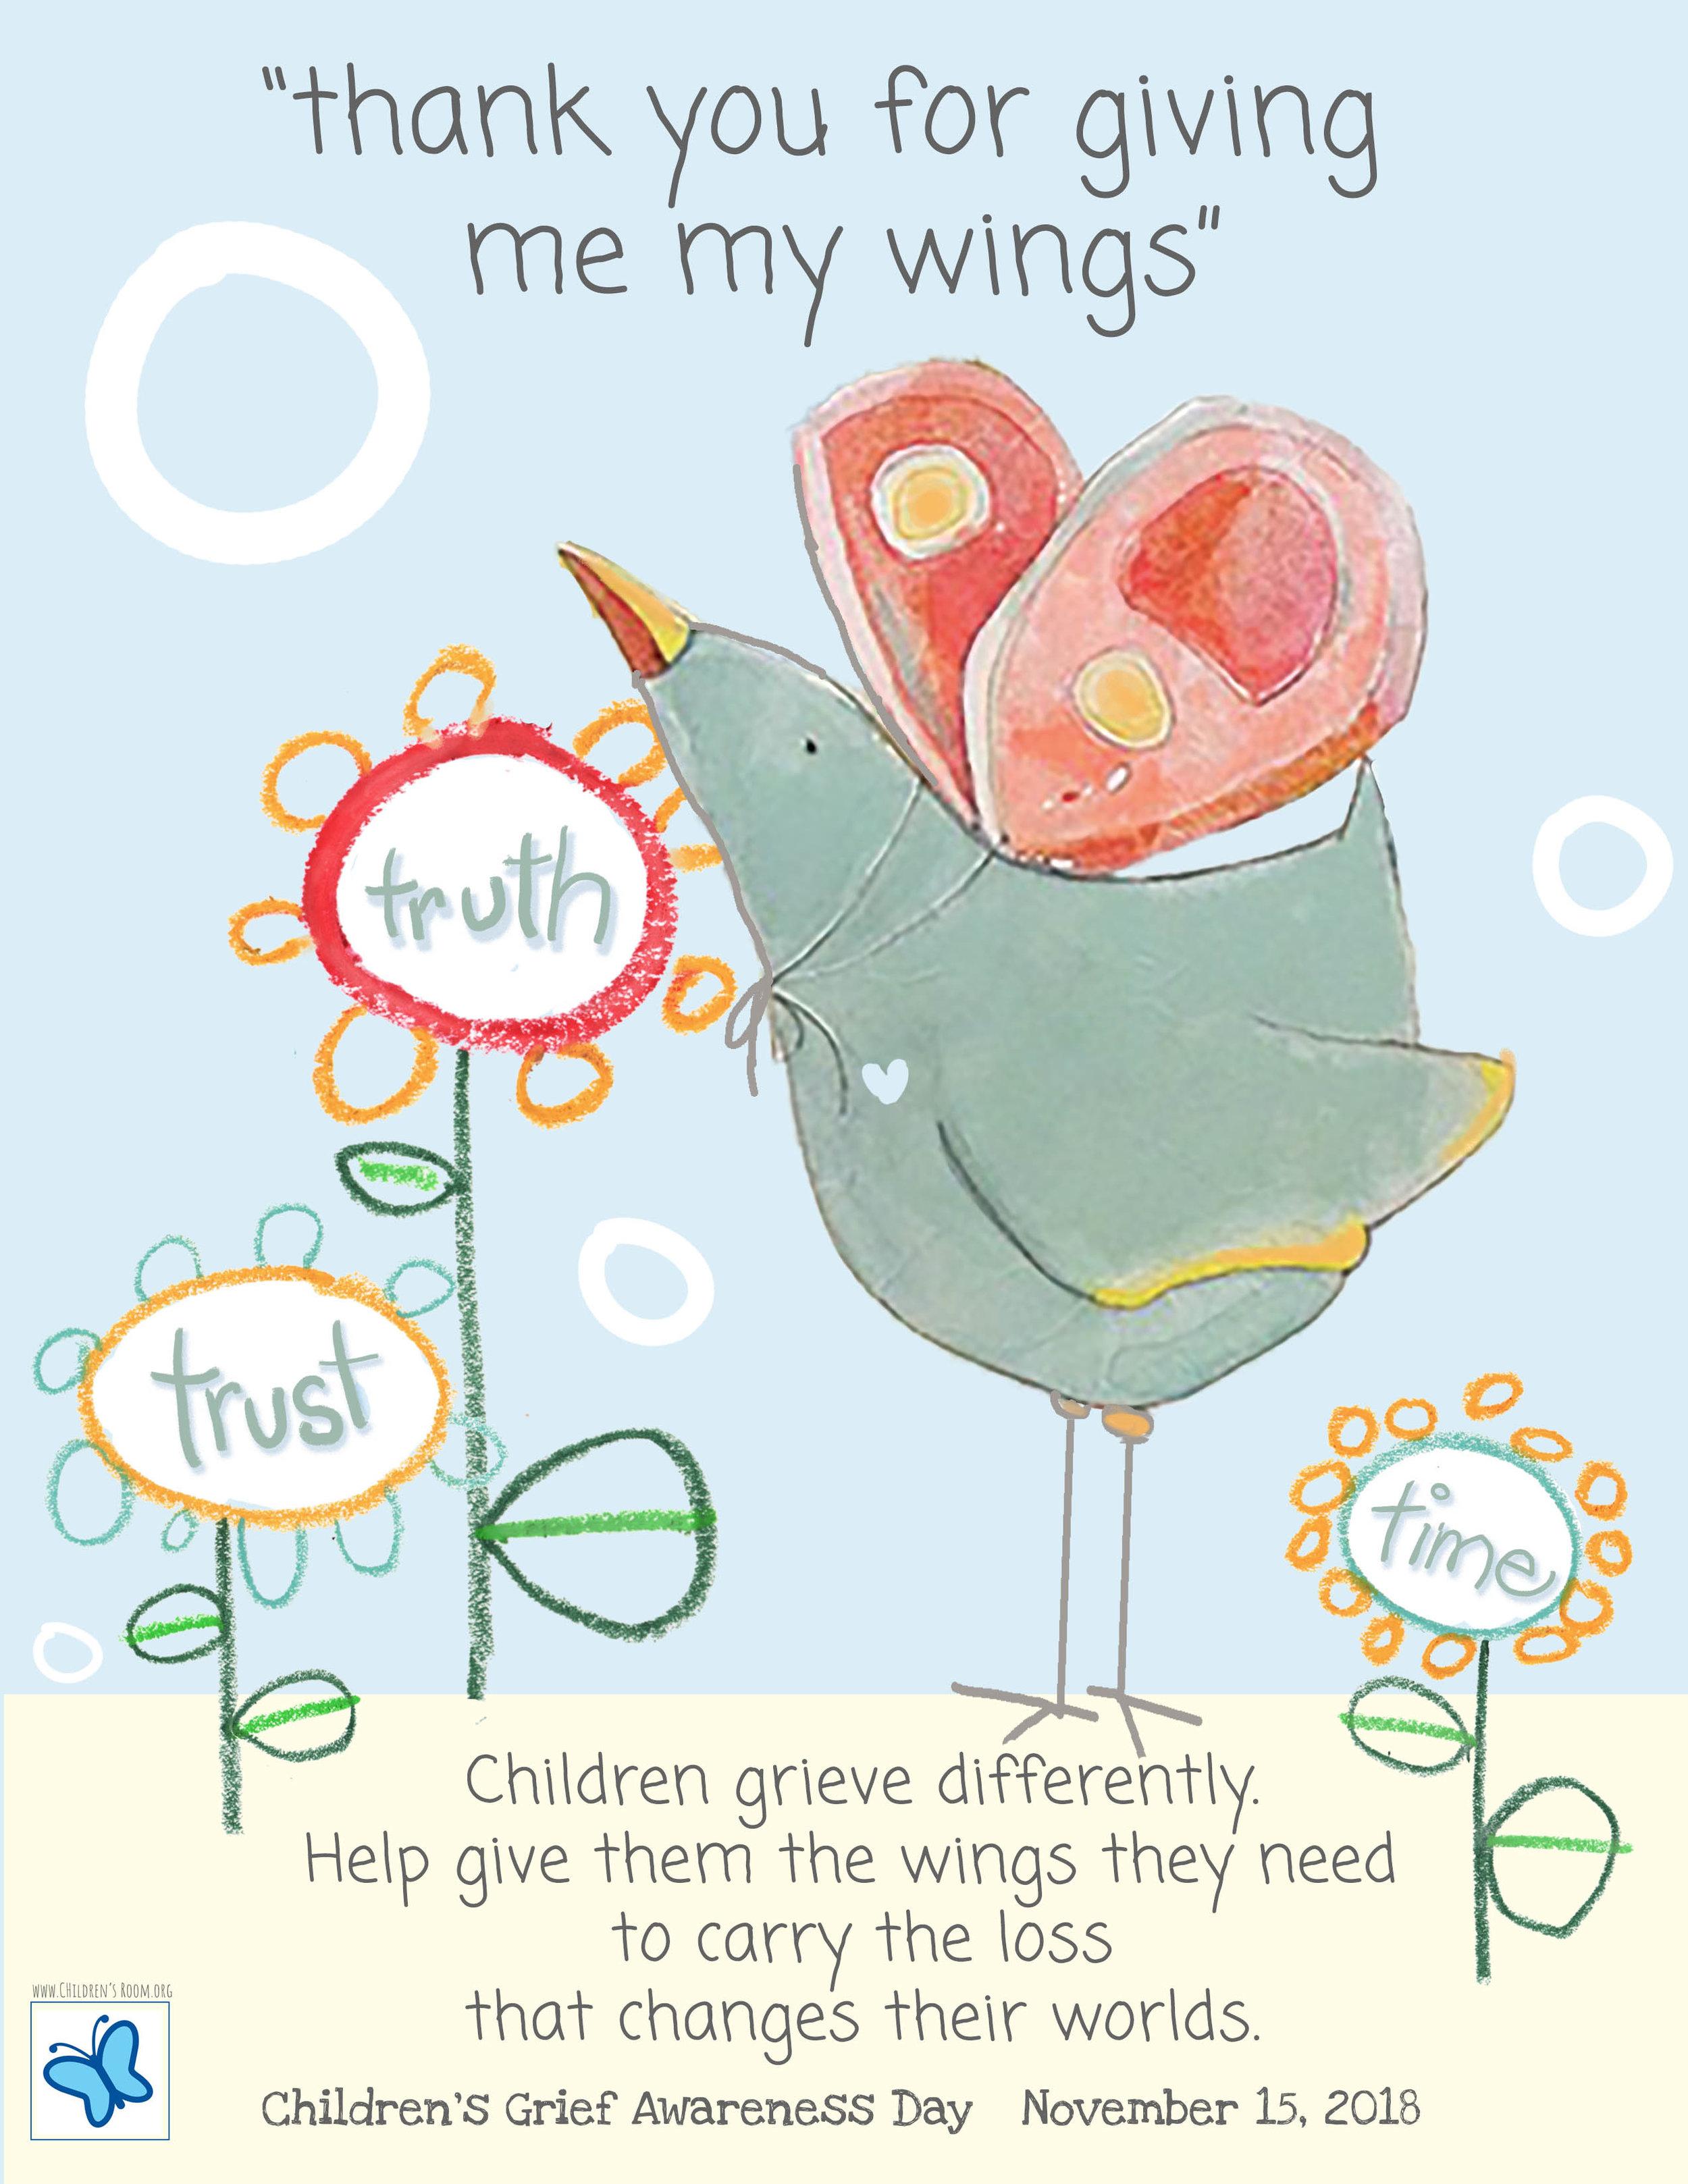 Public Service Announcement - Children's Grief Awareness Day